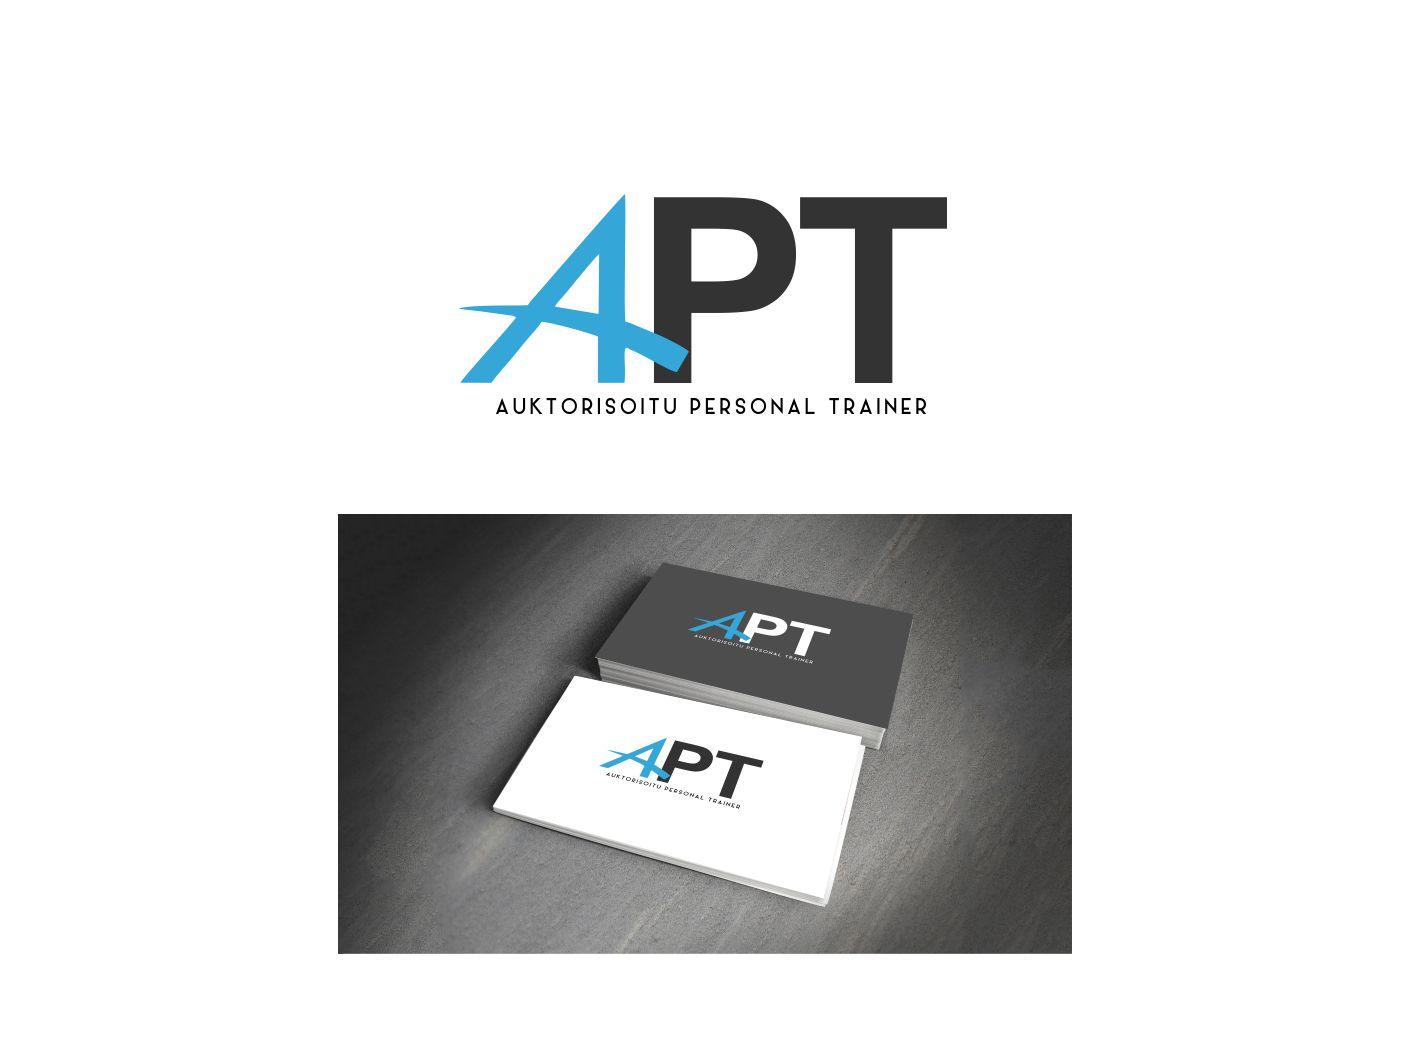 personal trainer logo design for auktorisoitu personal